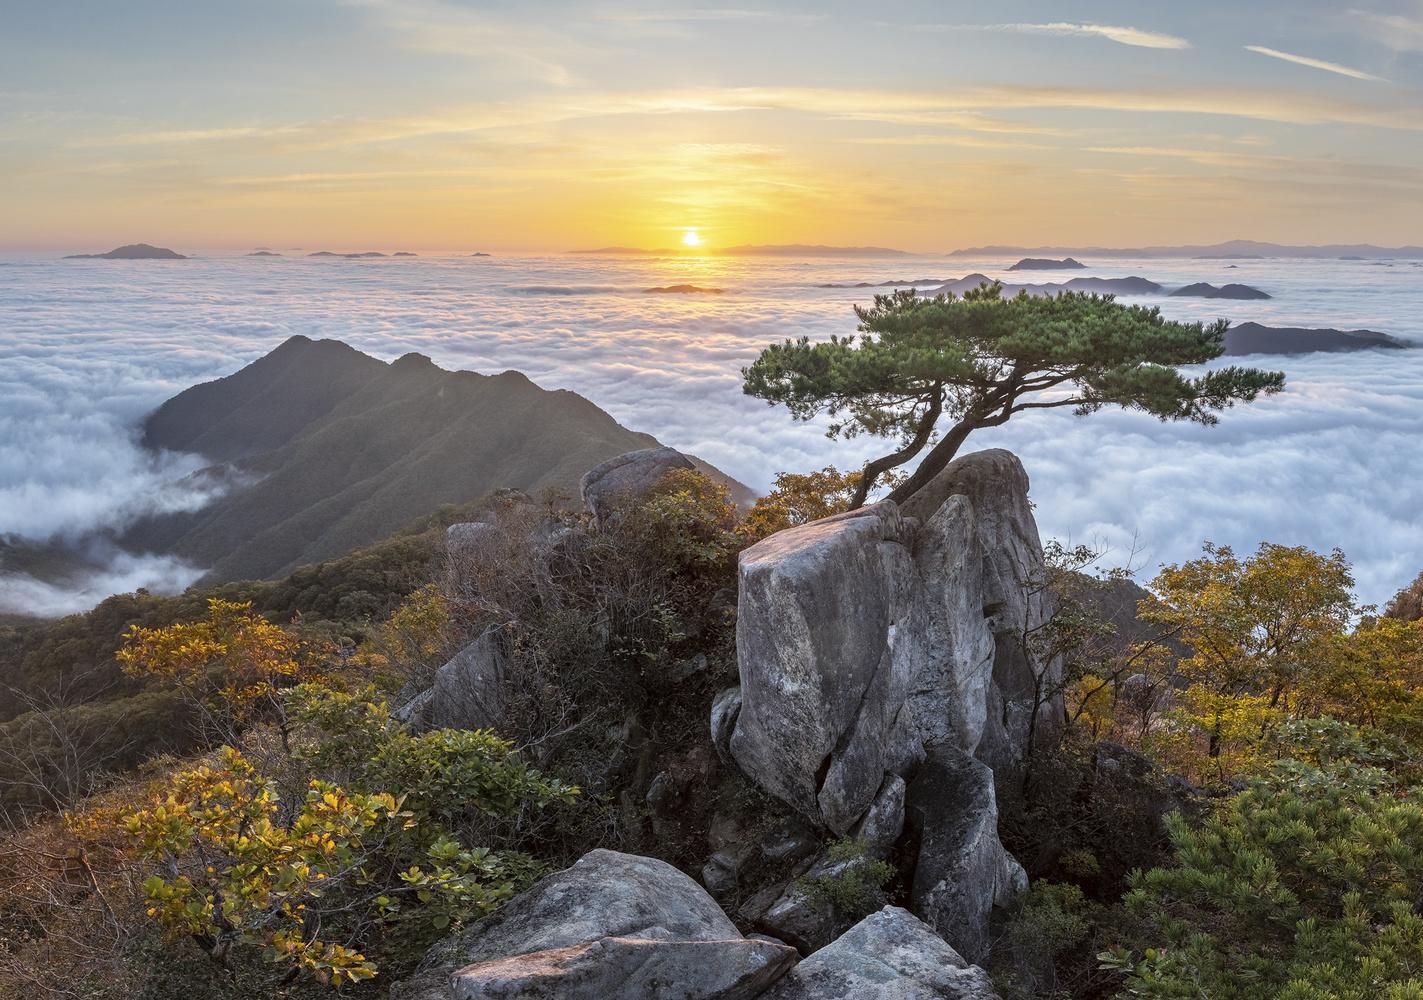 Greeting Pine by jaeyoun Ryu